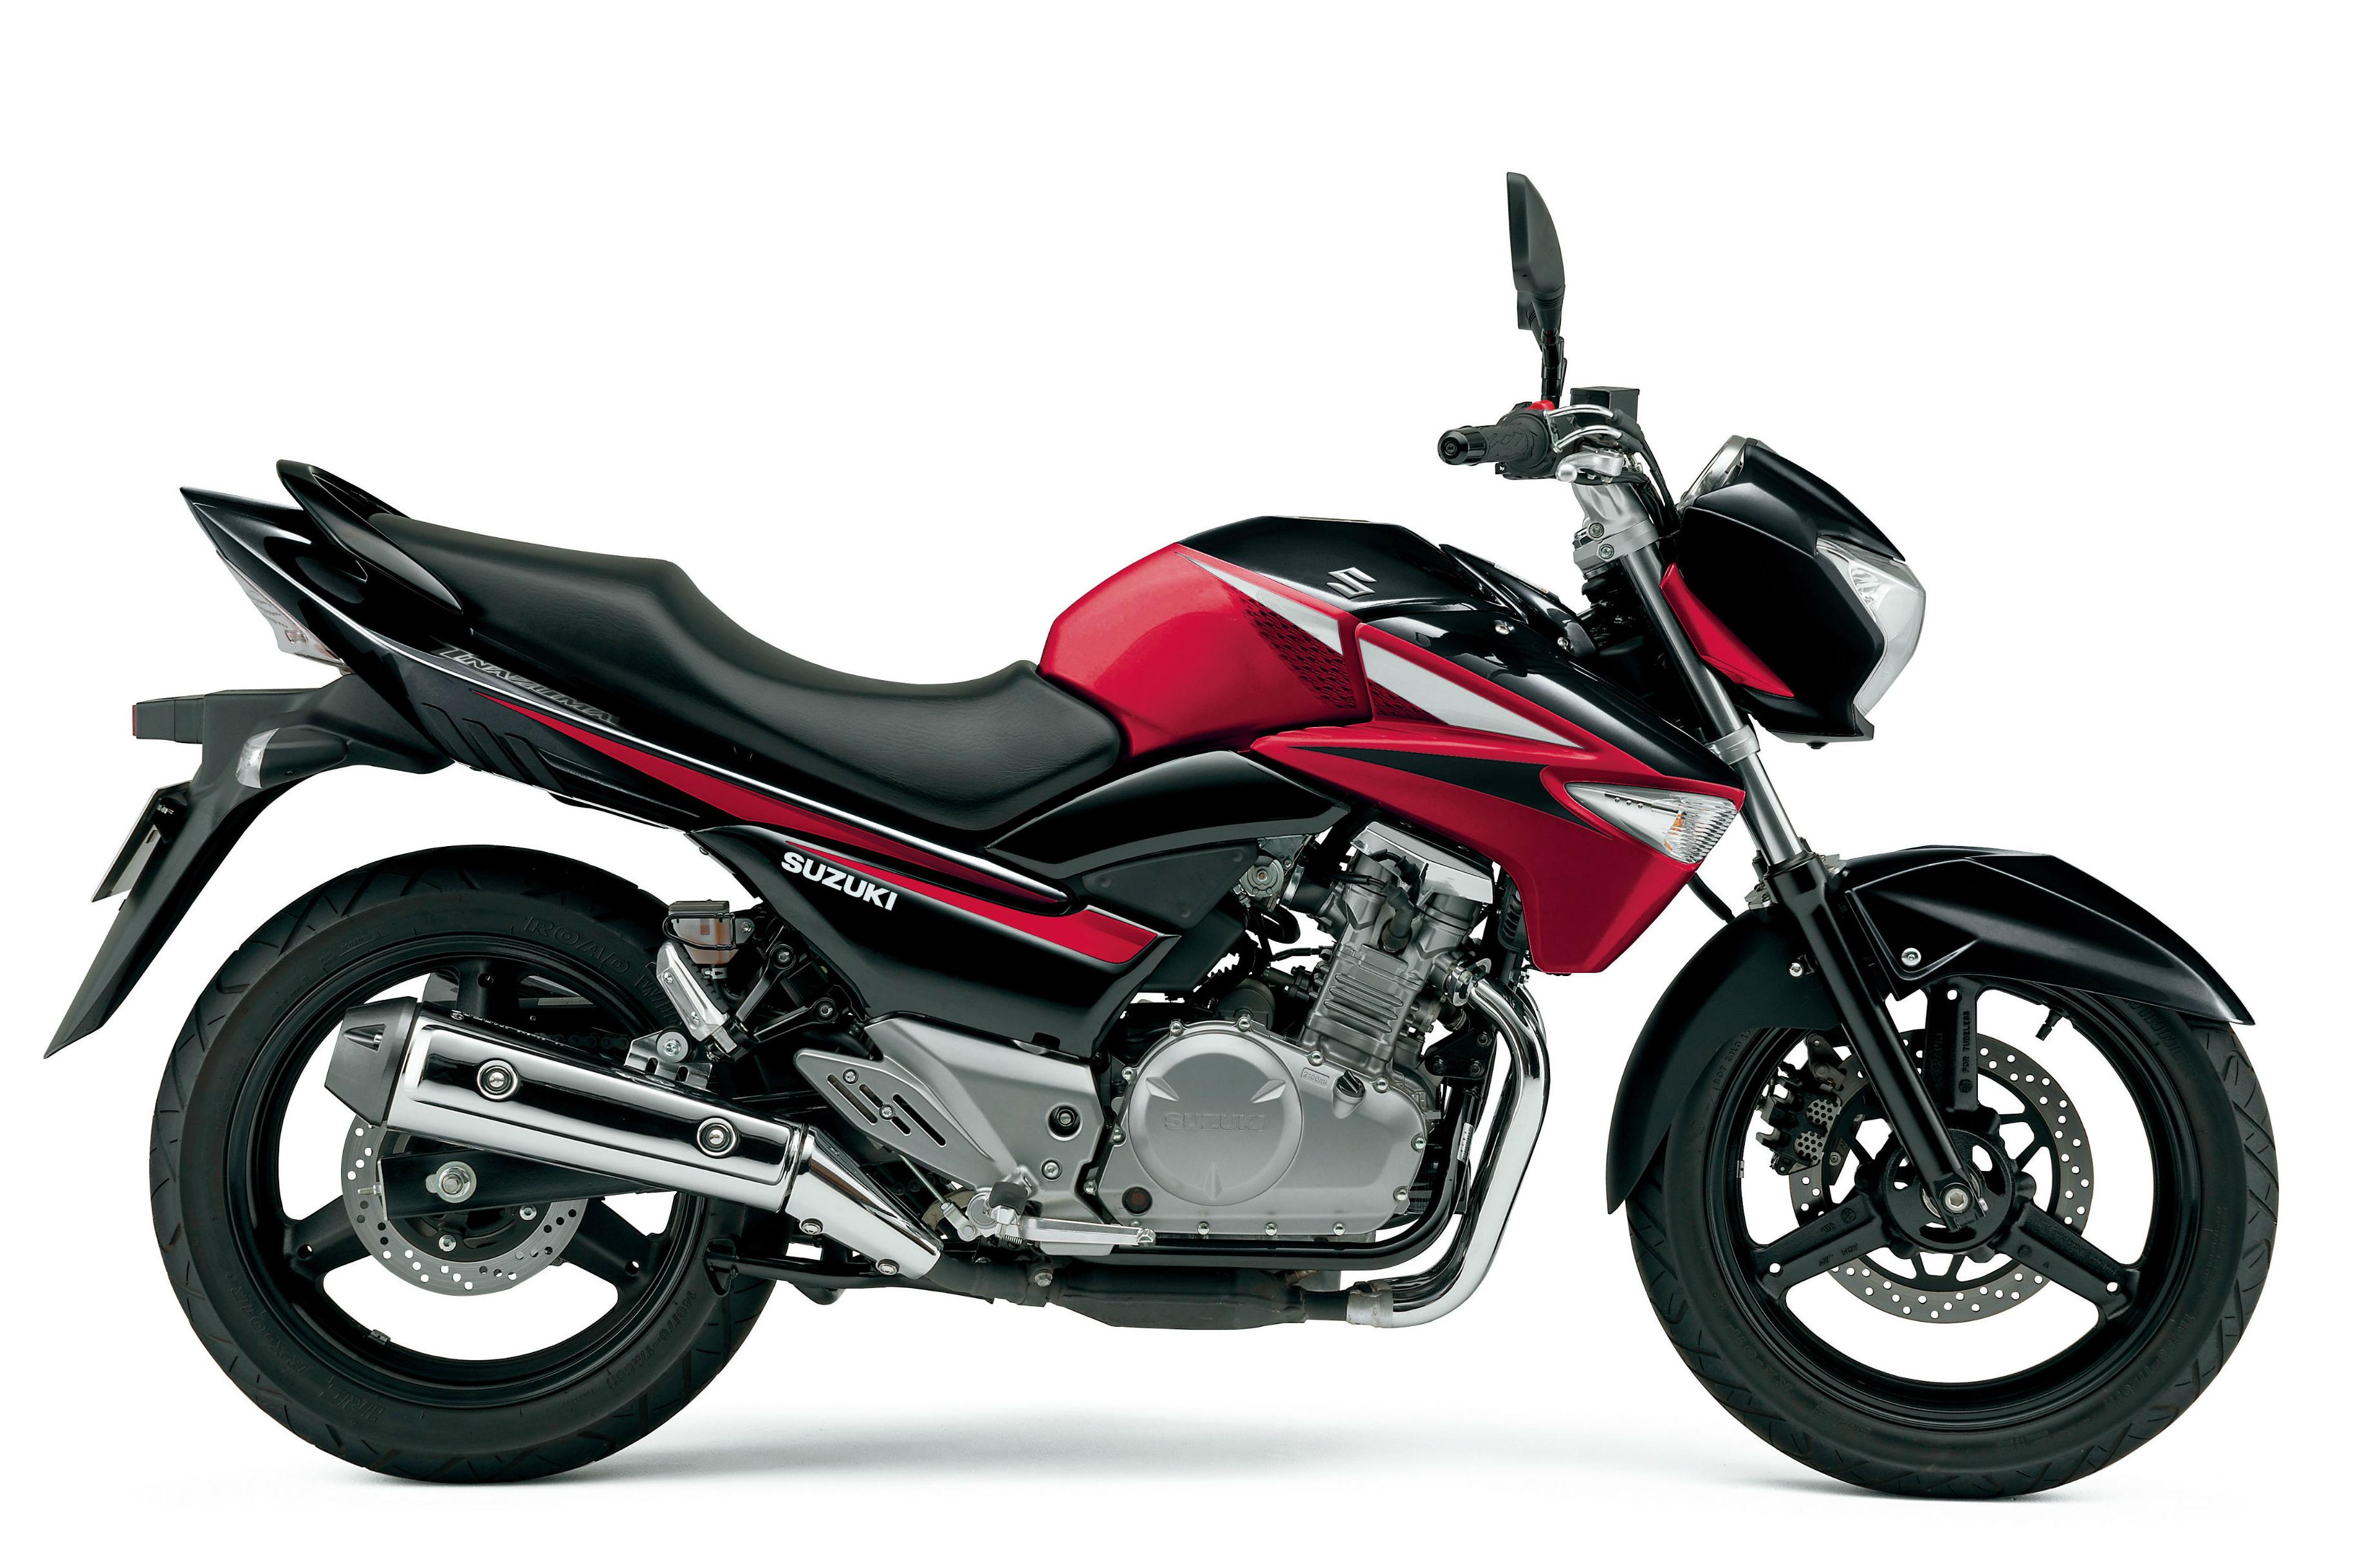 Top 10 brand new bikes under 500cc visordown for Yamaha 400cc motorcycle